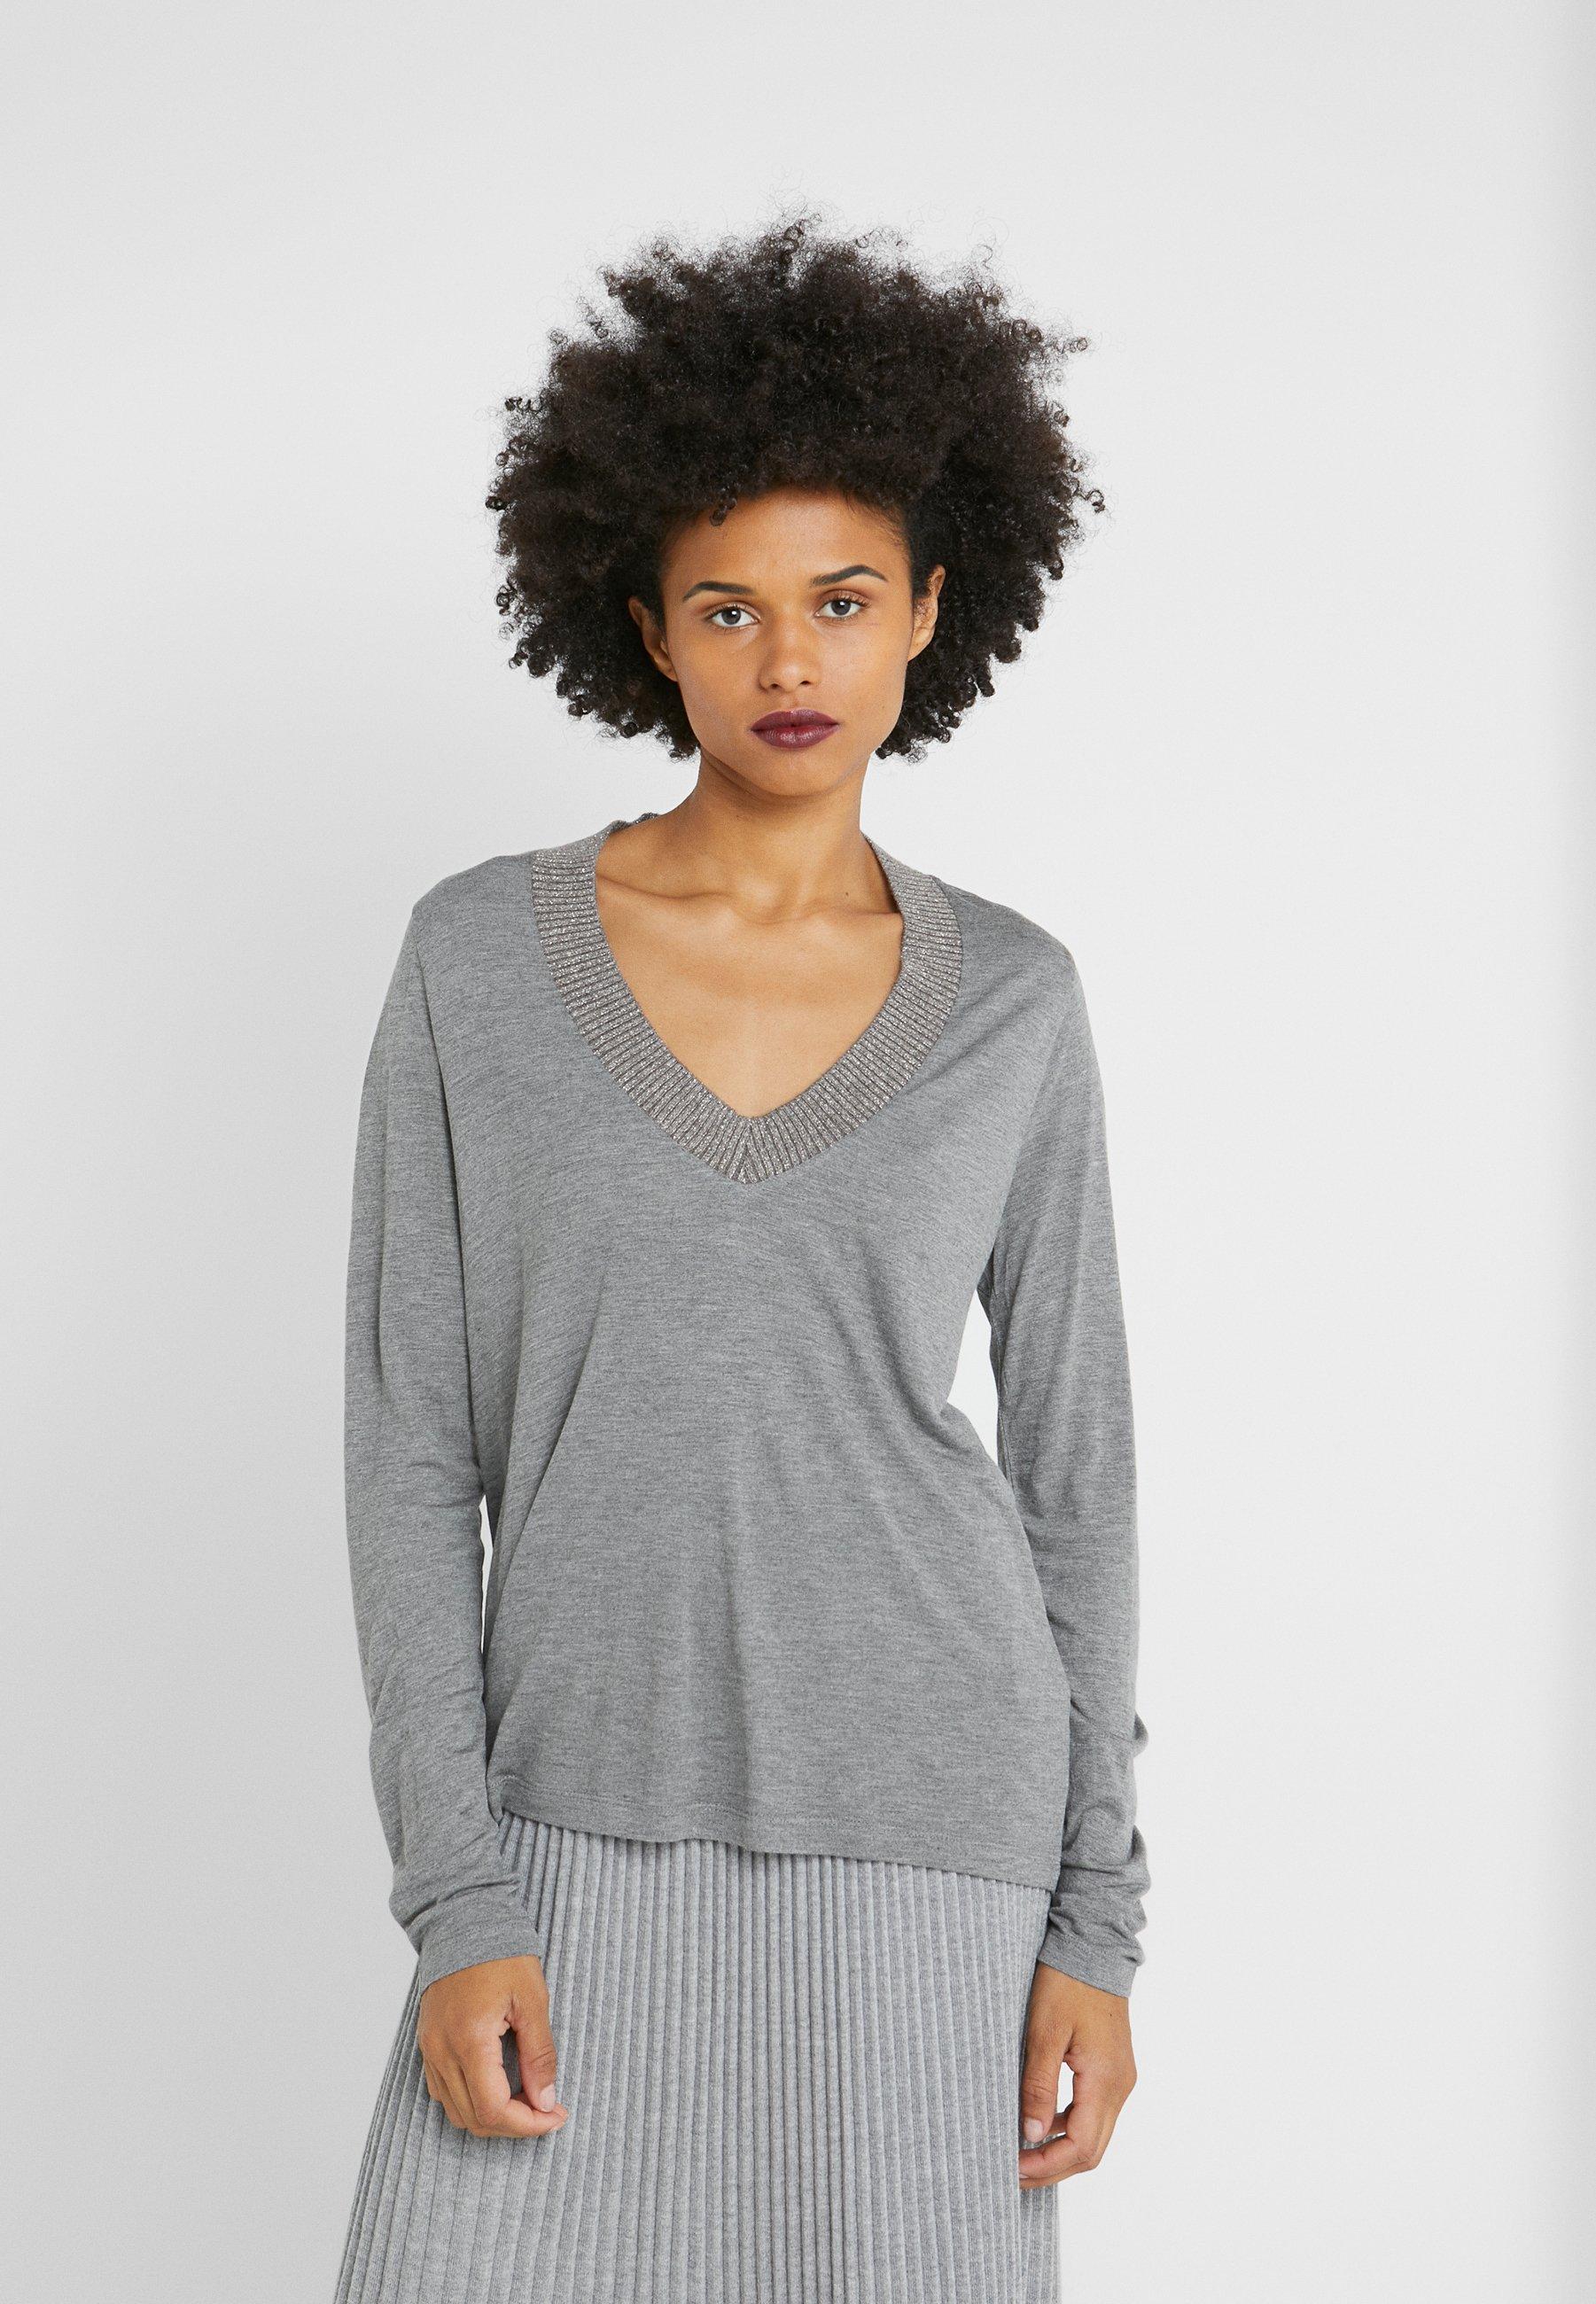 Maglietta Grey Ftc Cashmere A Lunga Manica Mottled DIe9YHEW2